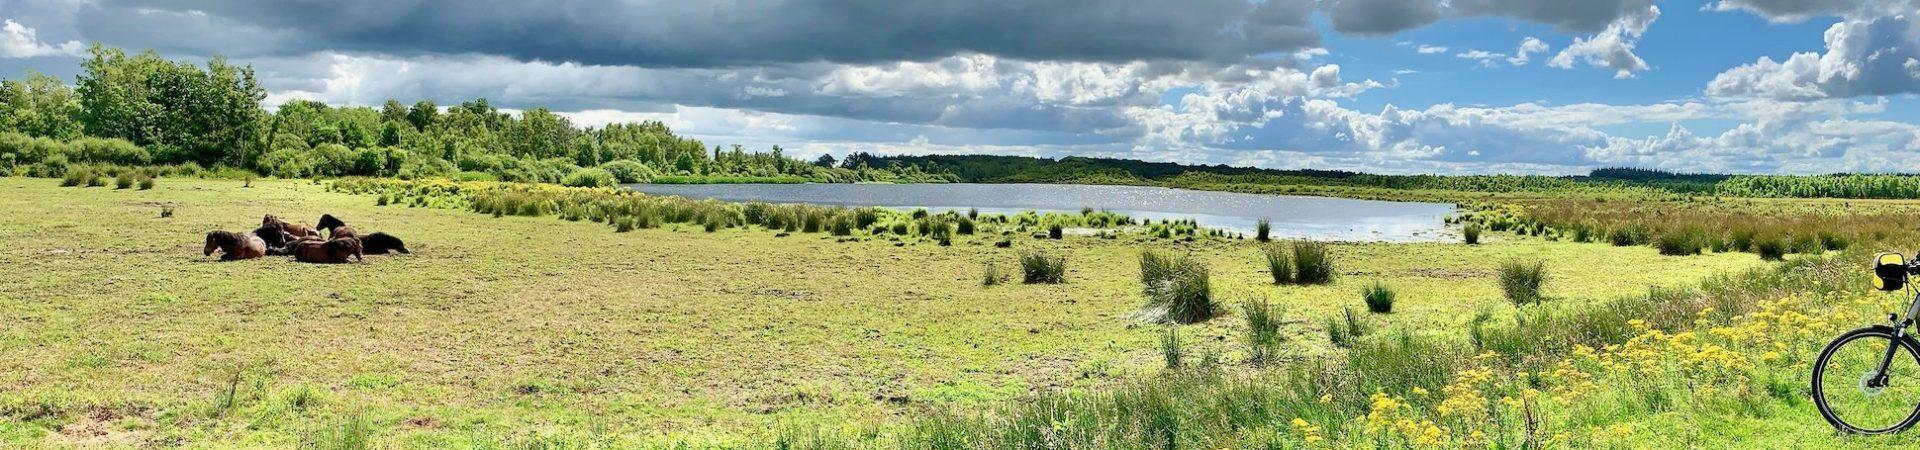 Fietsroute, fietsblog, review, rondje Drenthe